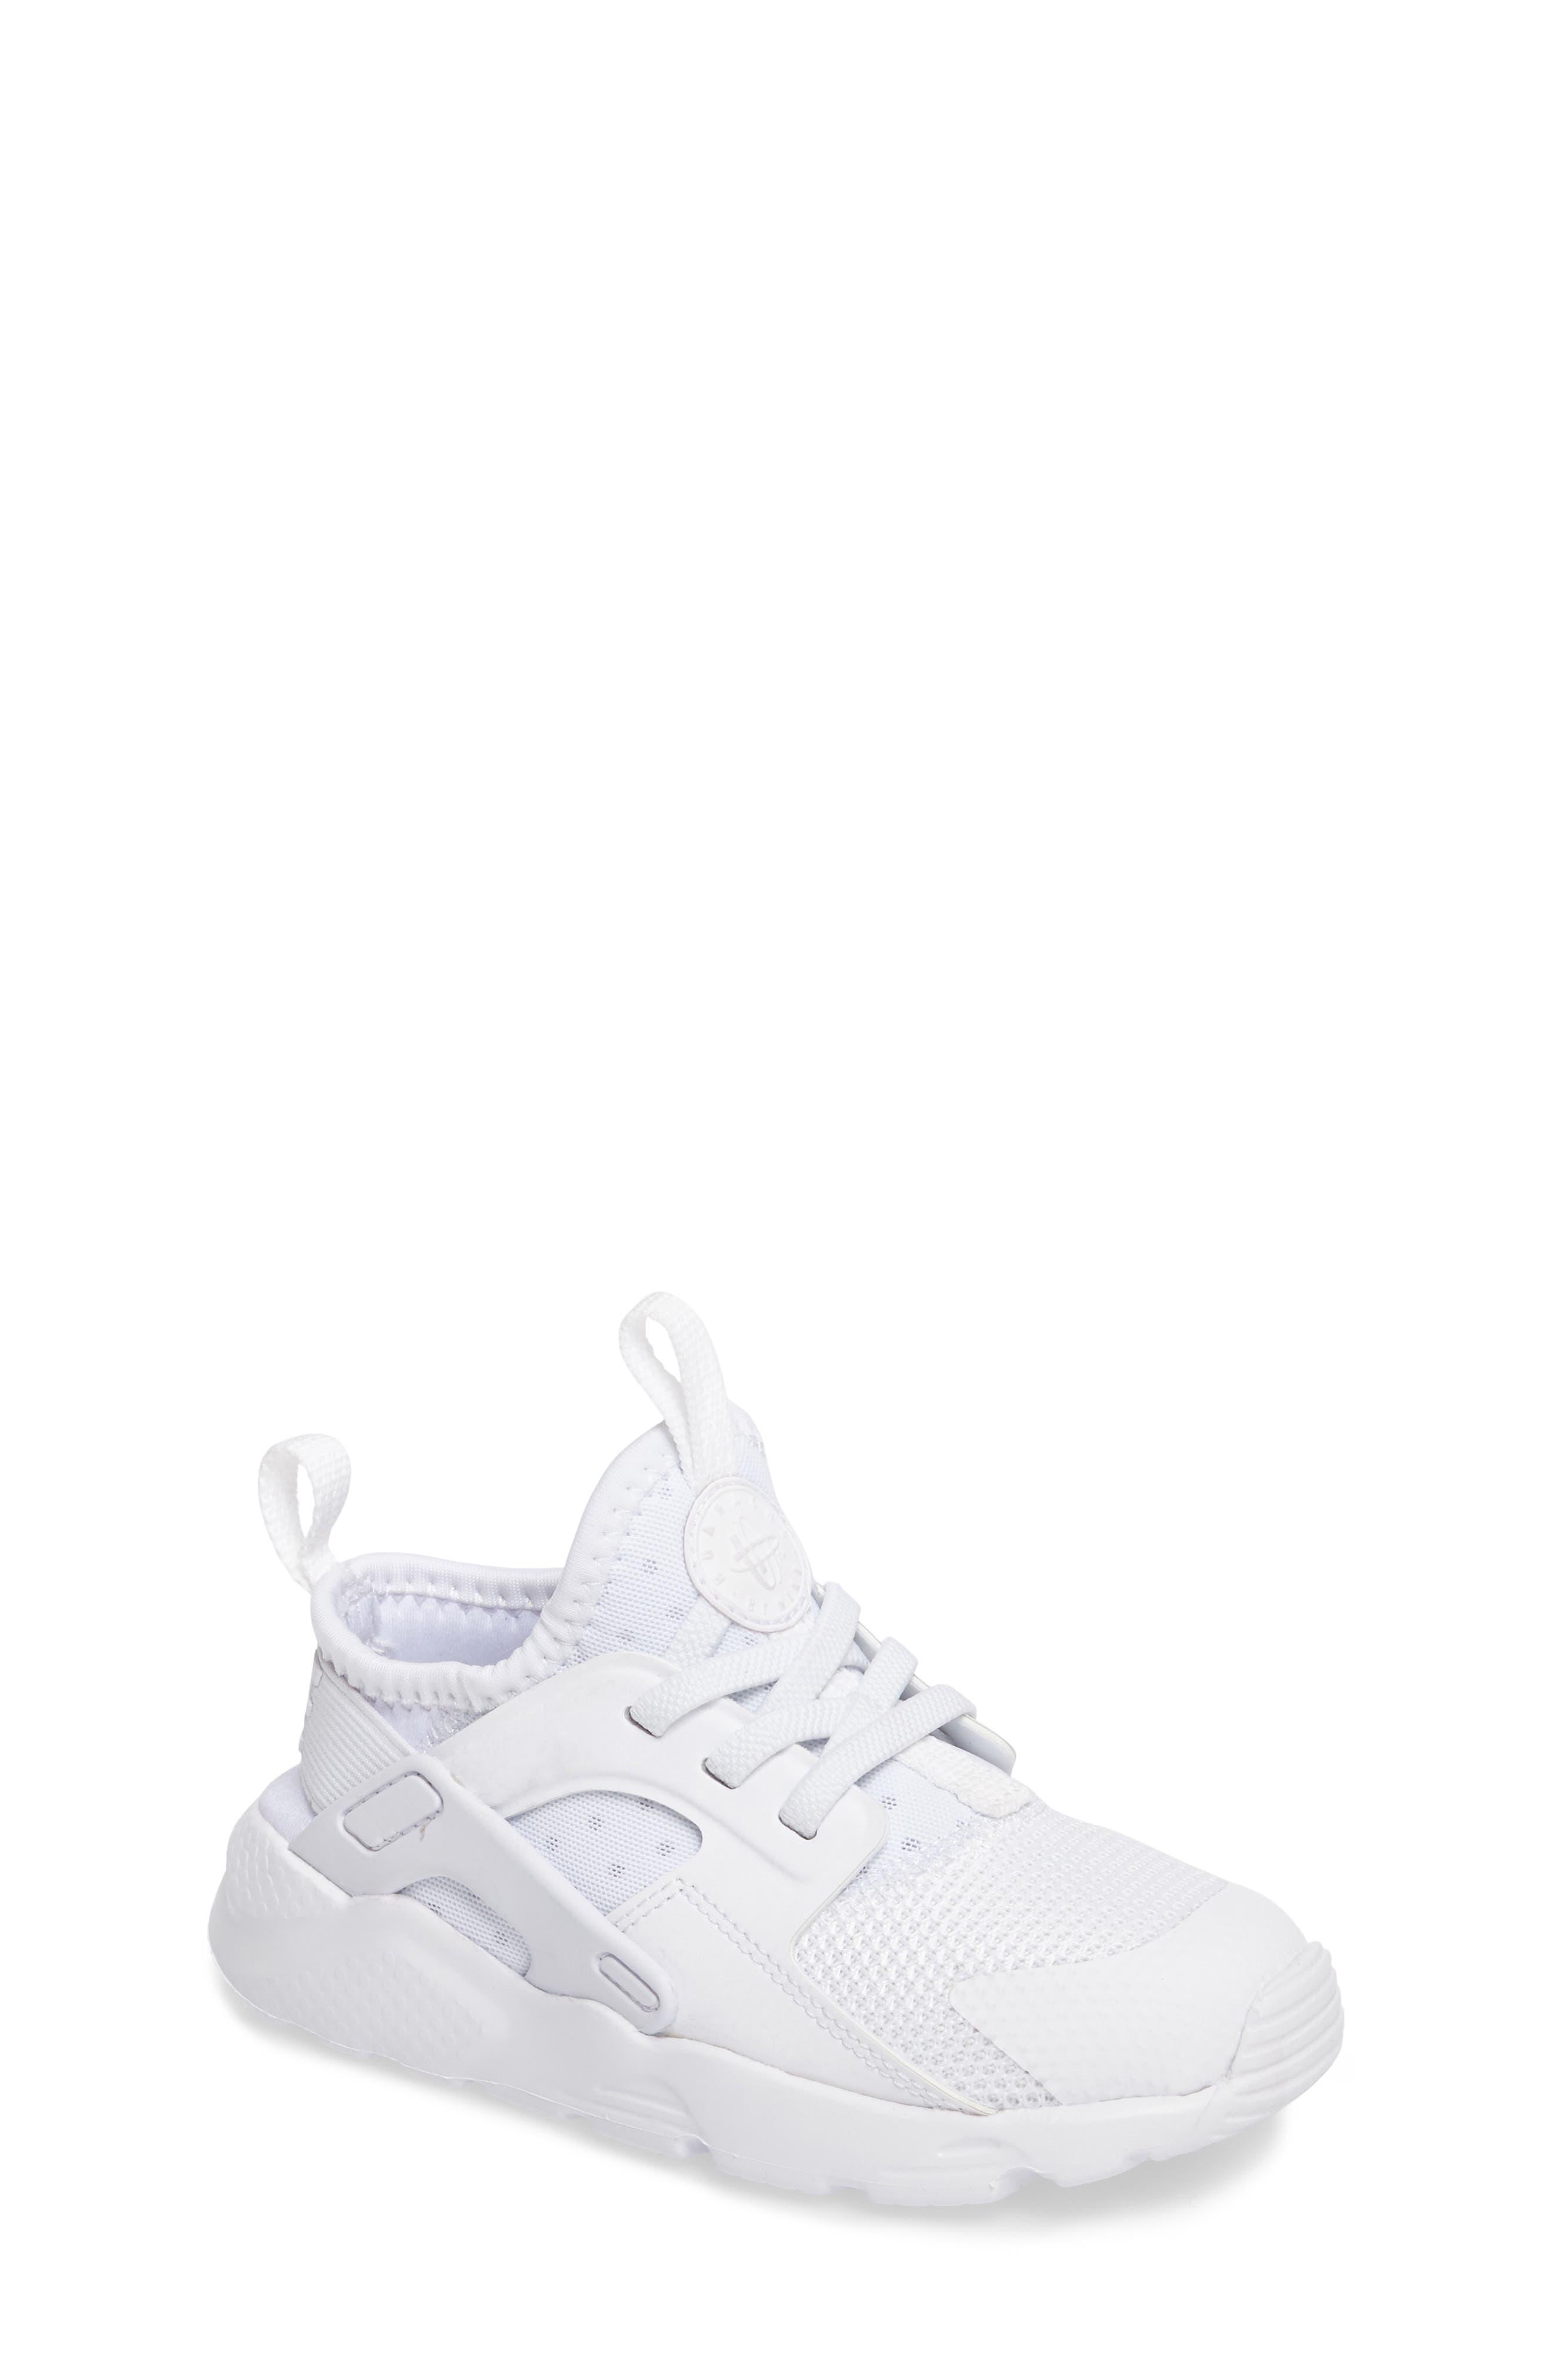 Main Image - Nike Huarache Run Ultra Sneaker (Baby, Walker & Toddler)